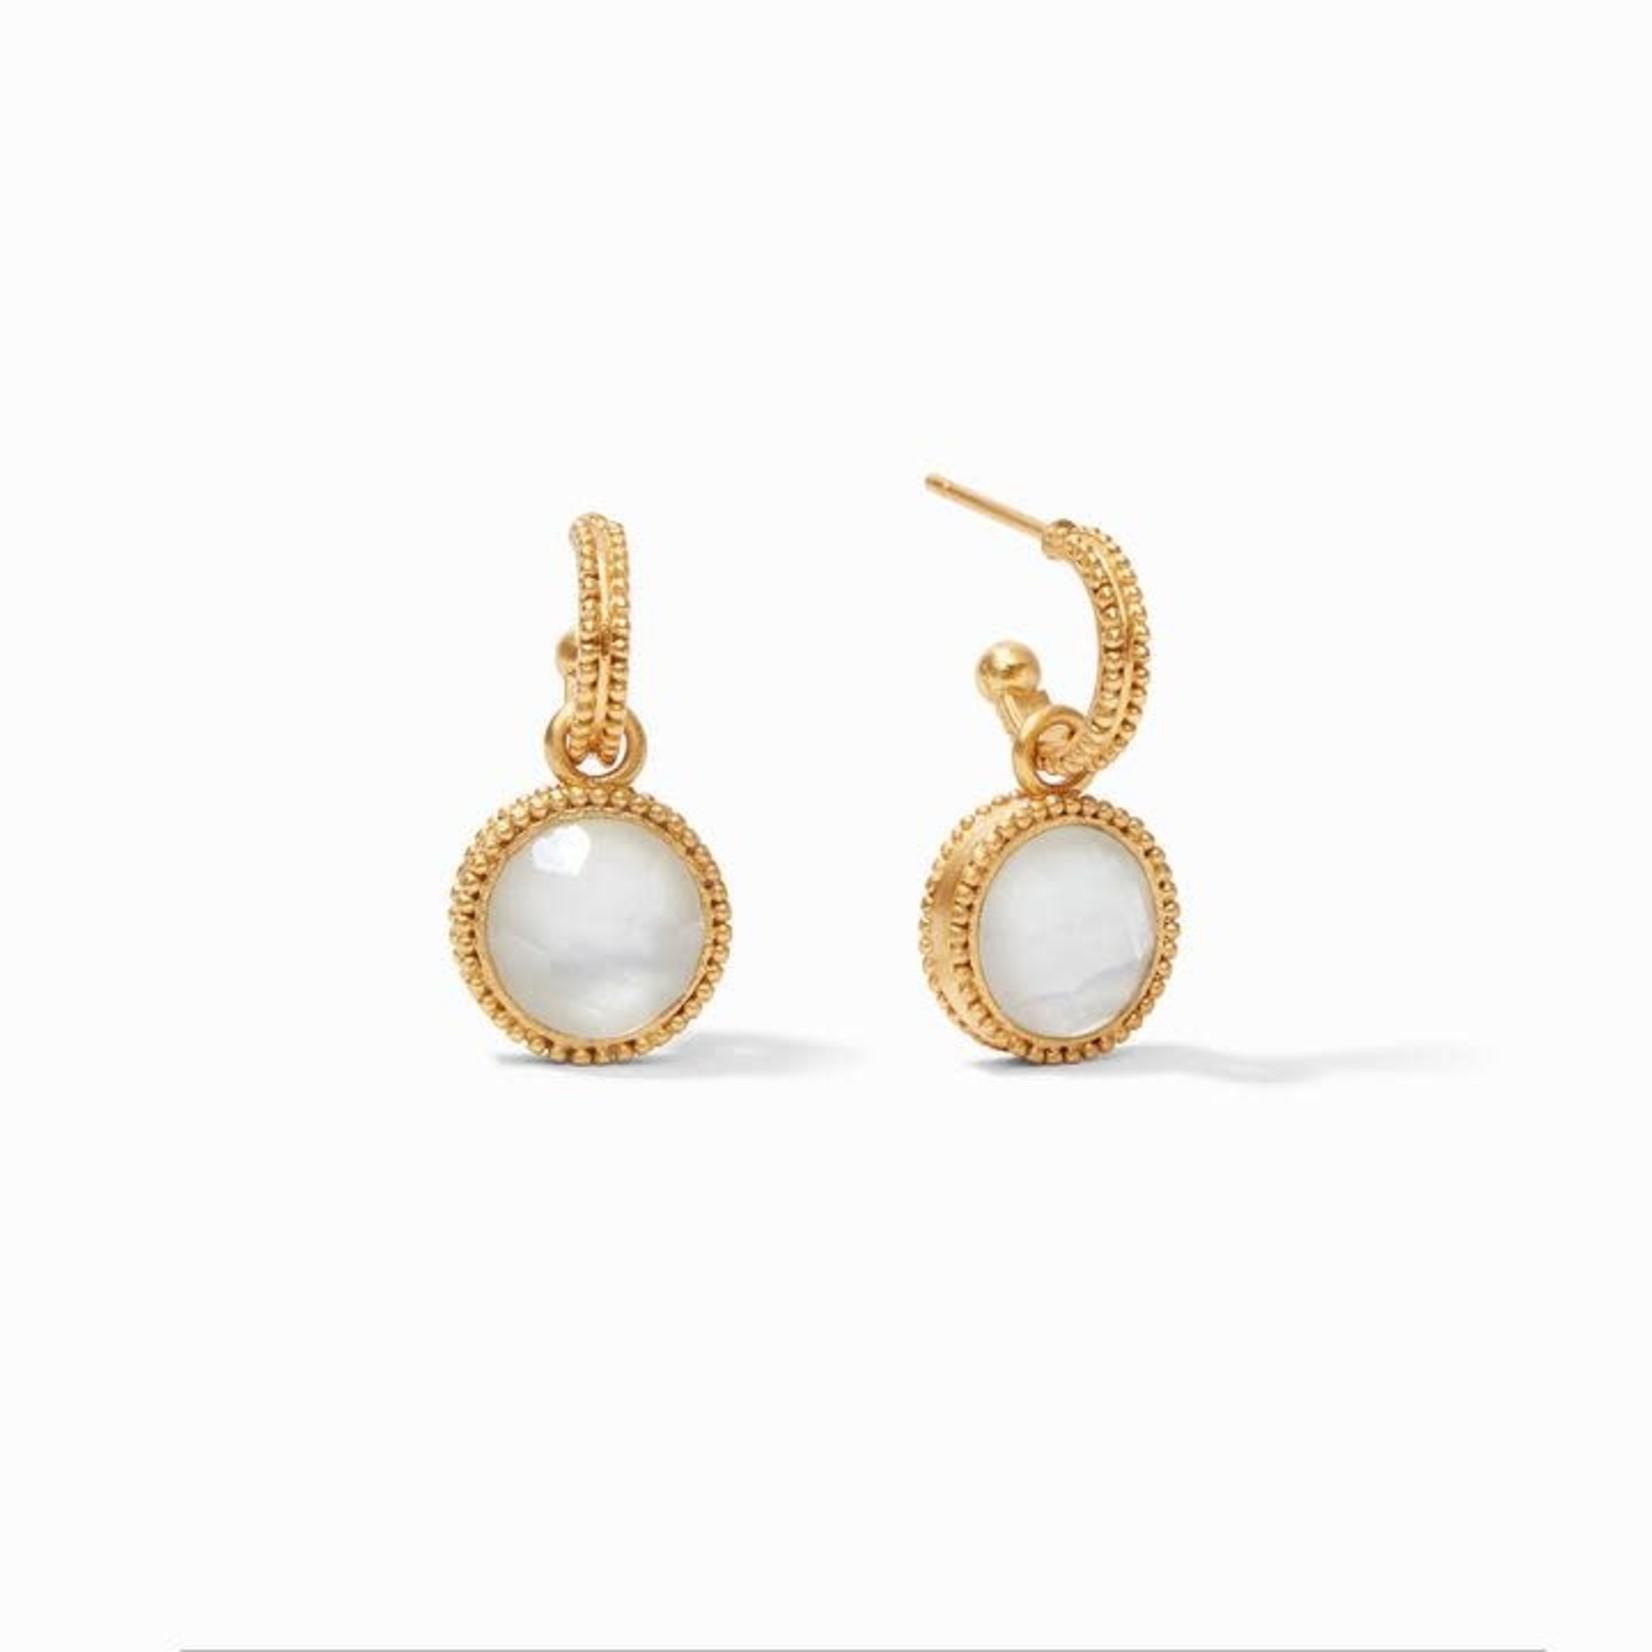 Julie Vos Fleur-de-Lis Hoop & Charm Earring - Iridescent Clear Crystal Reversible